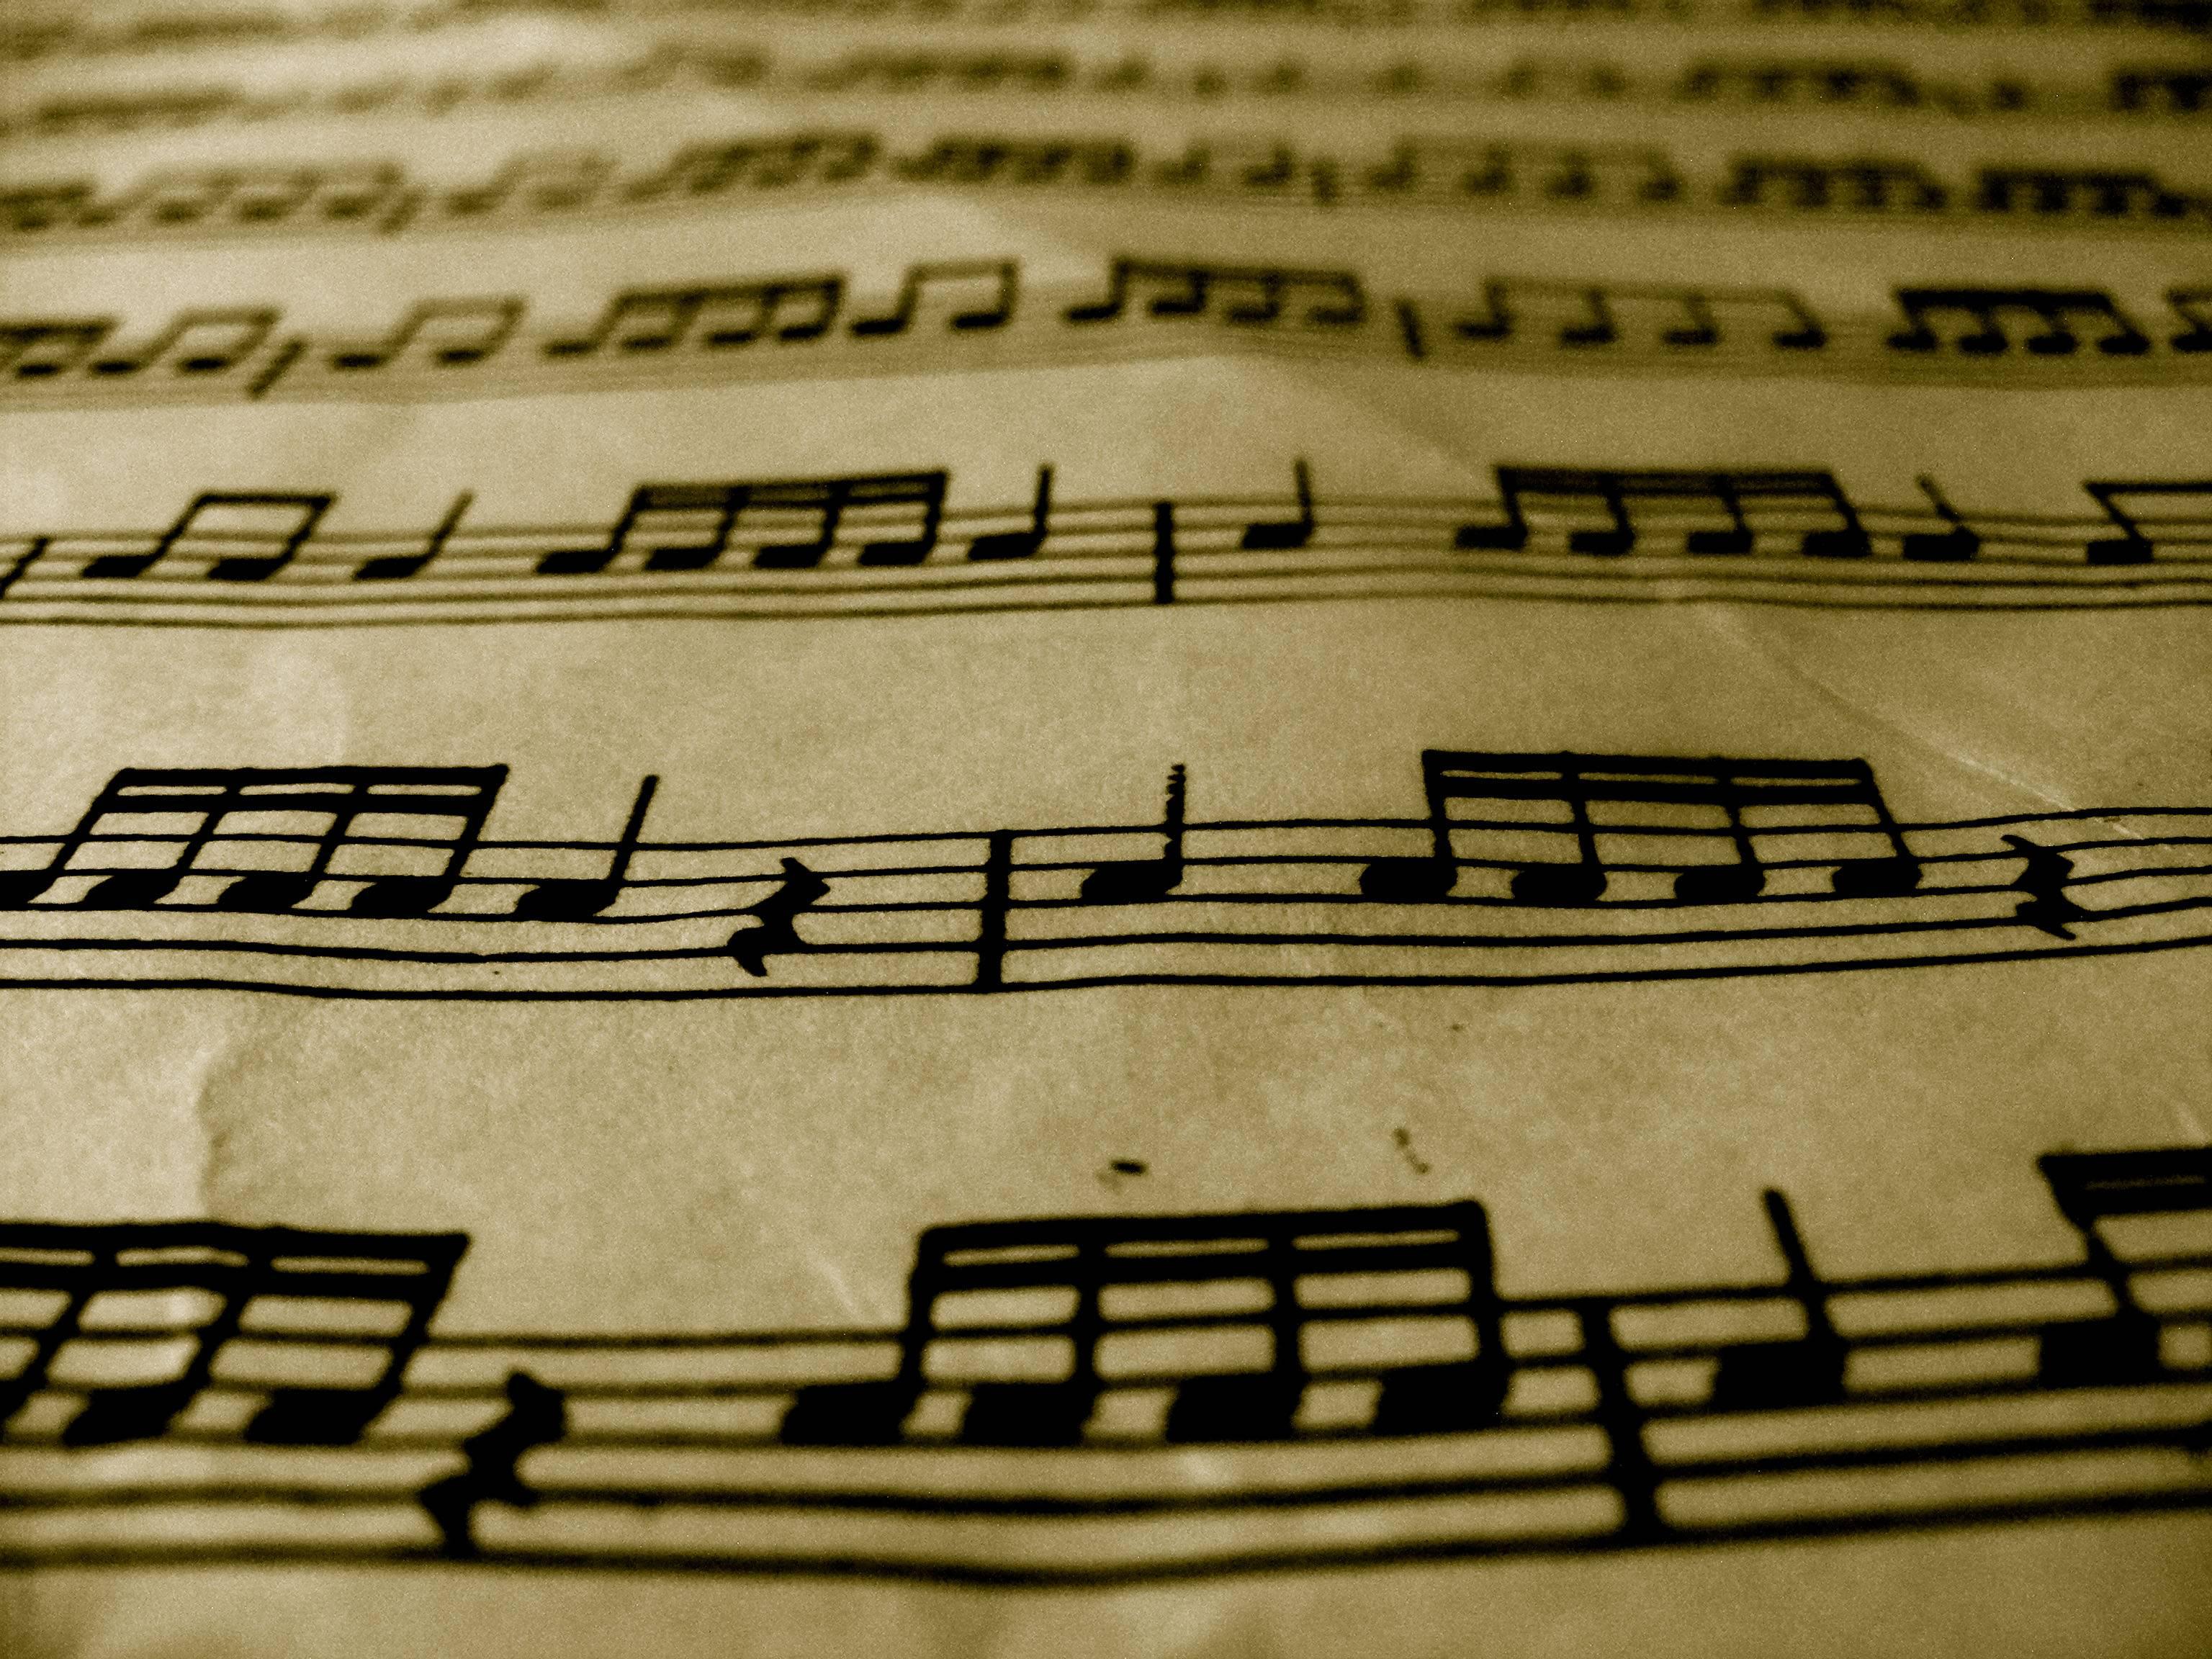 Music Sheet Wallpapers